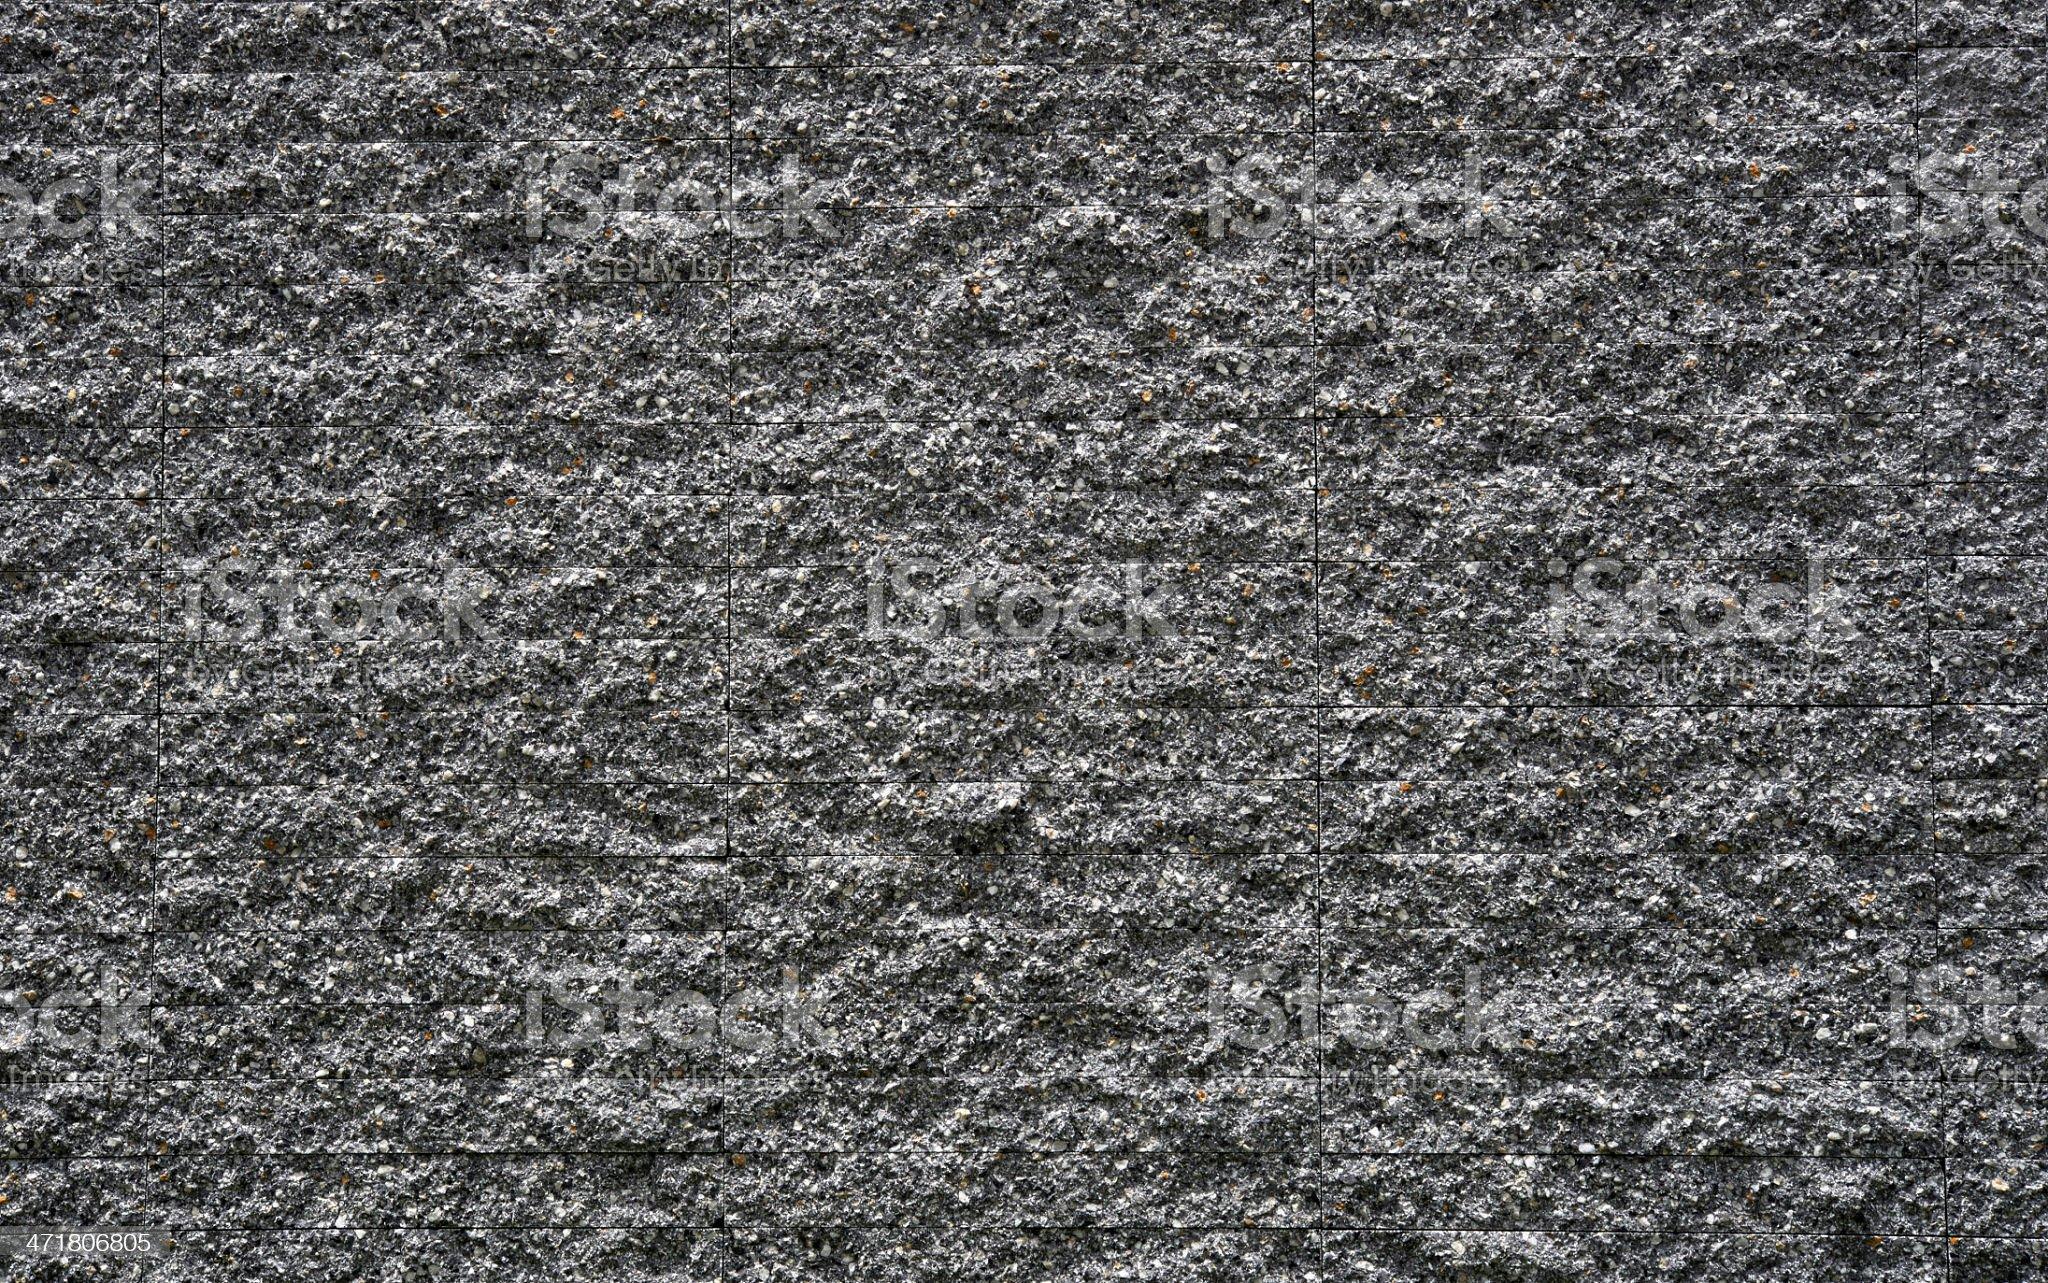 granite tile background royalty-free stock photo